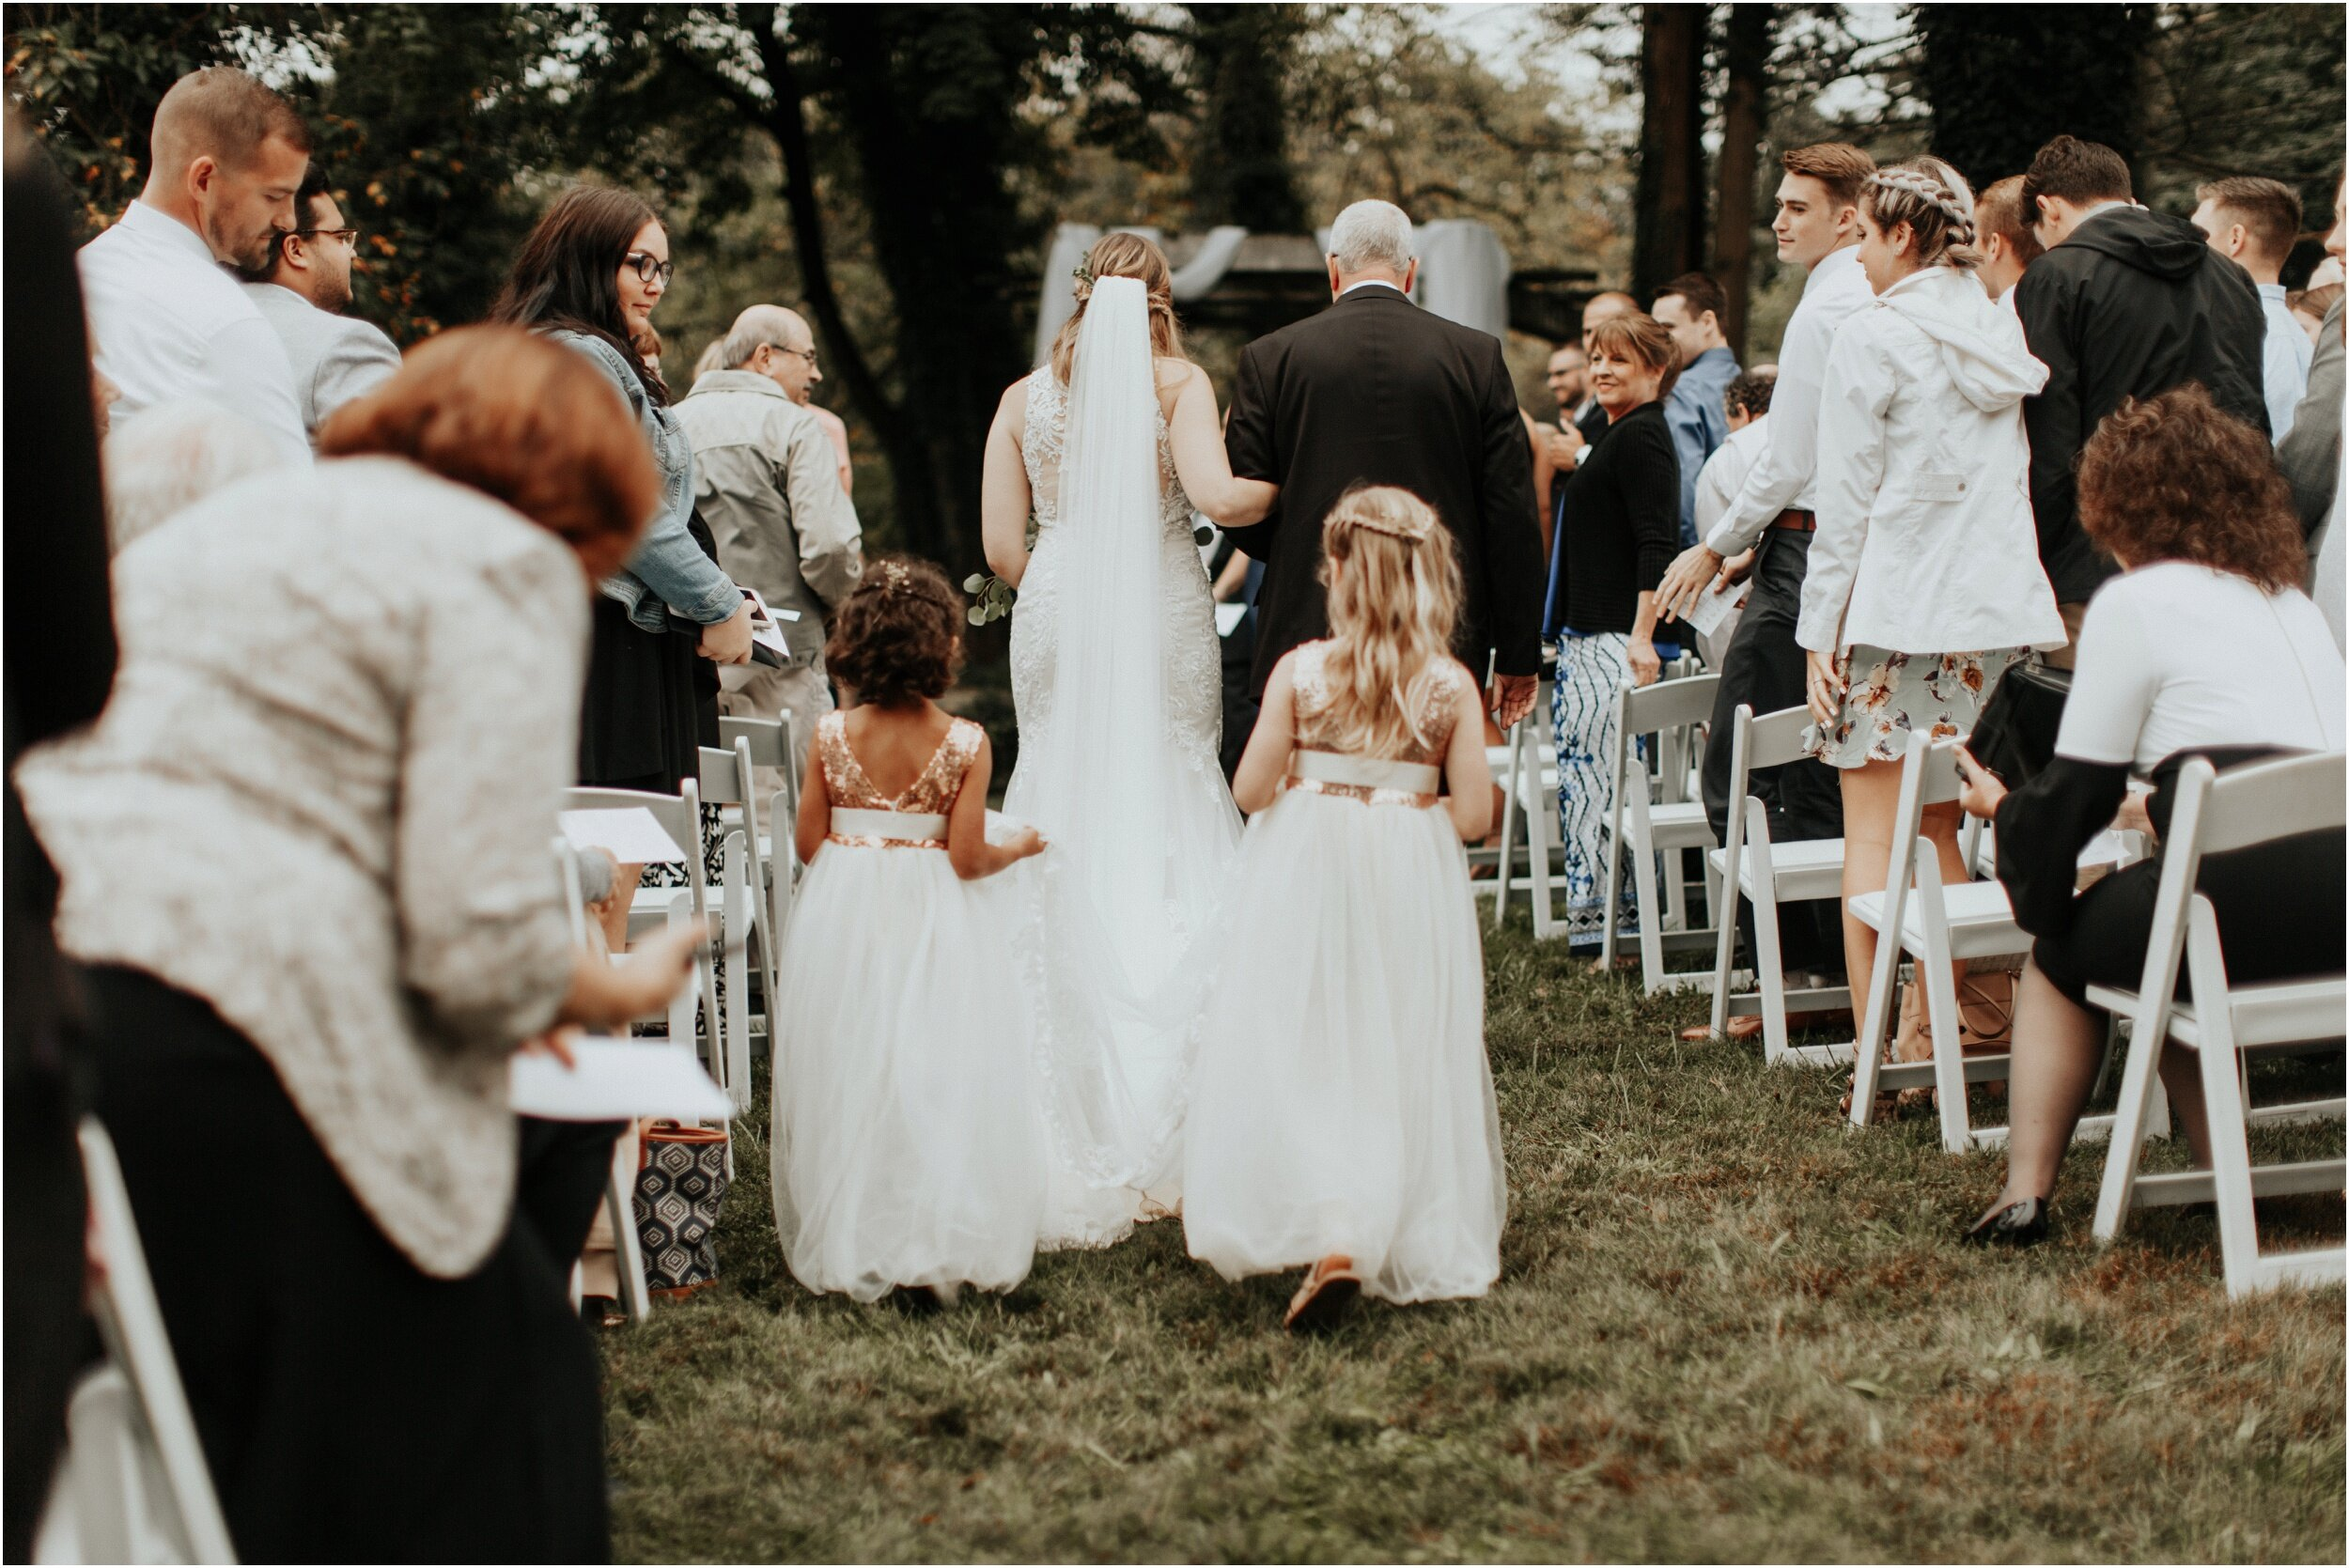 steph-and-jordan-cox-our-wedding-historic-shady-lane-compass-wedding-collective-hazel-lining-photography-destination-elopement-wedding-engagement-photography_0057.jpg